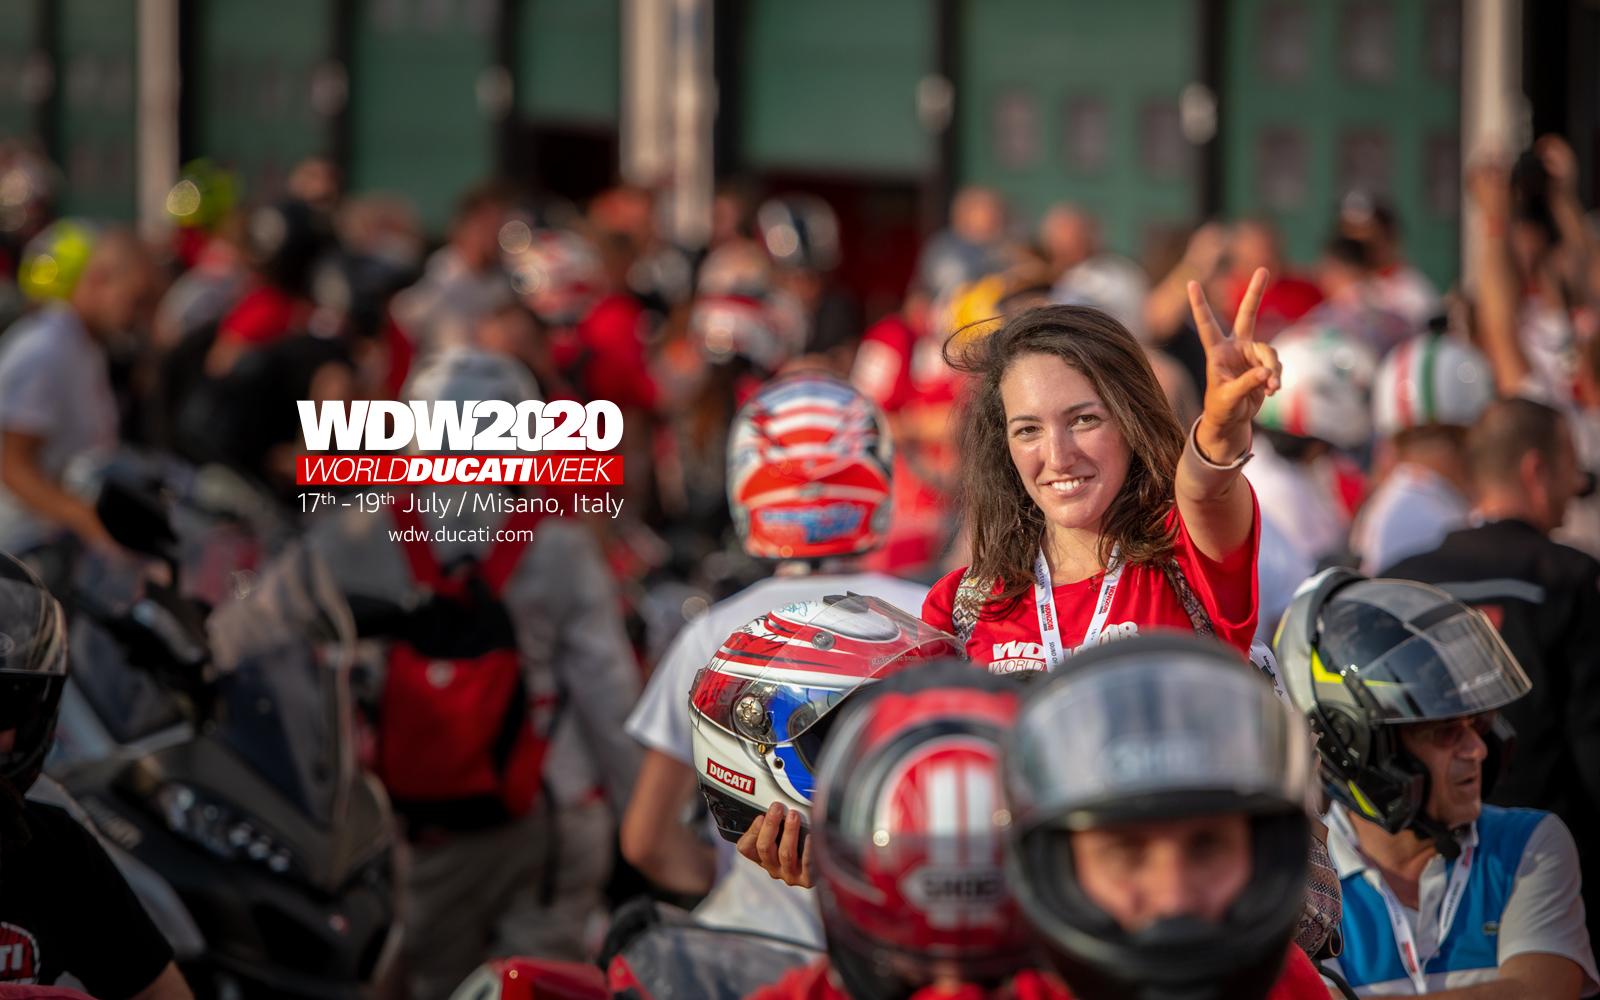 Ducati annuncia le date del World Ducati Week 2020